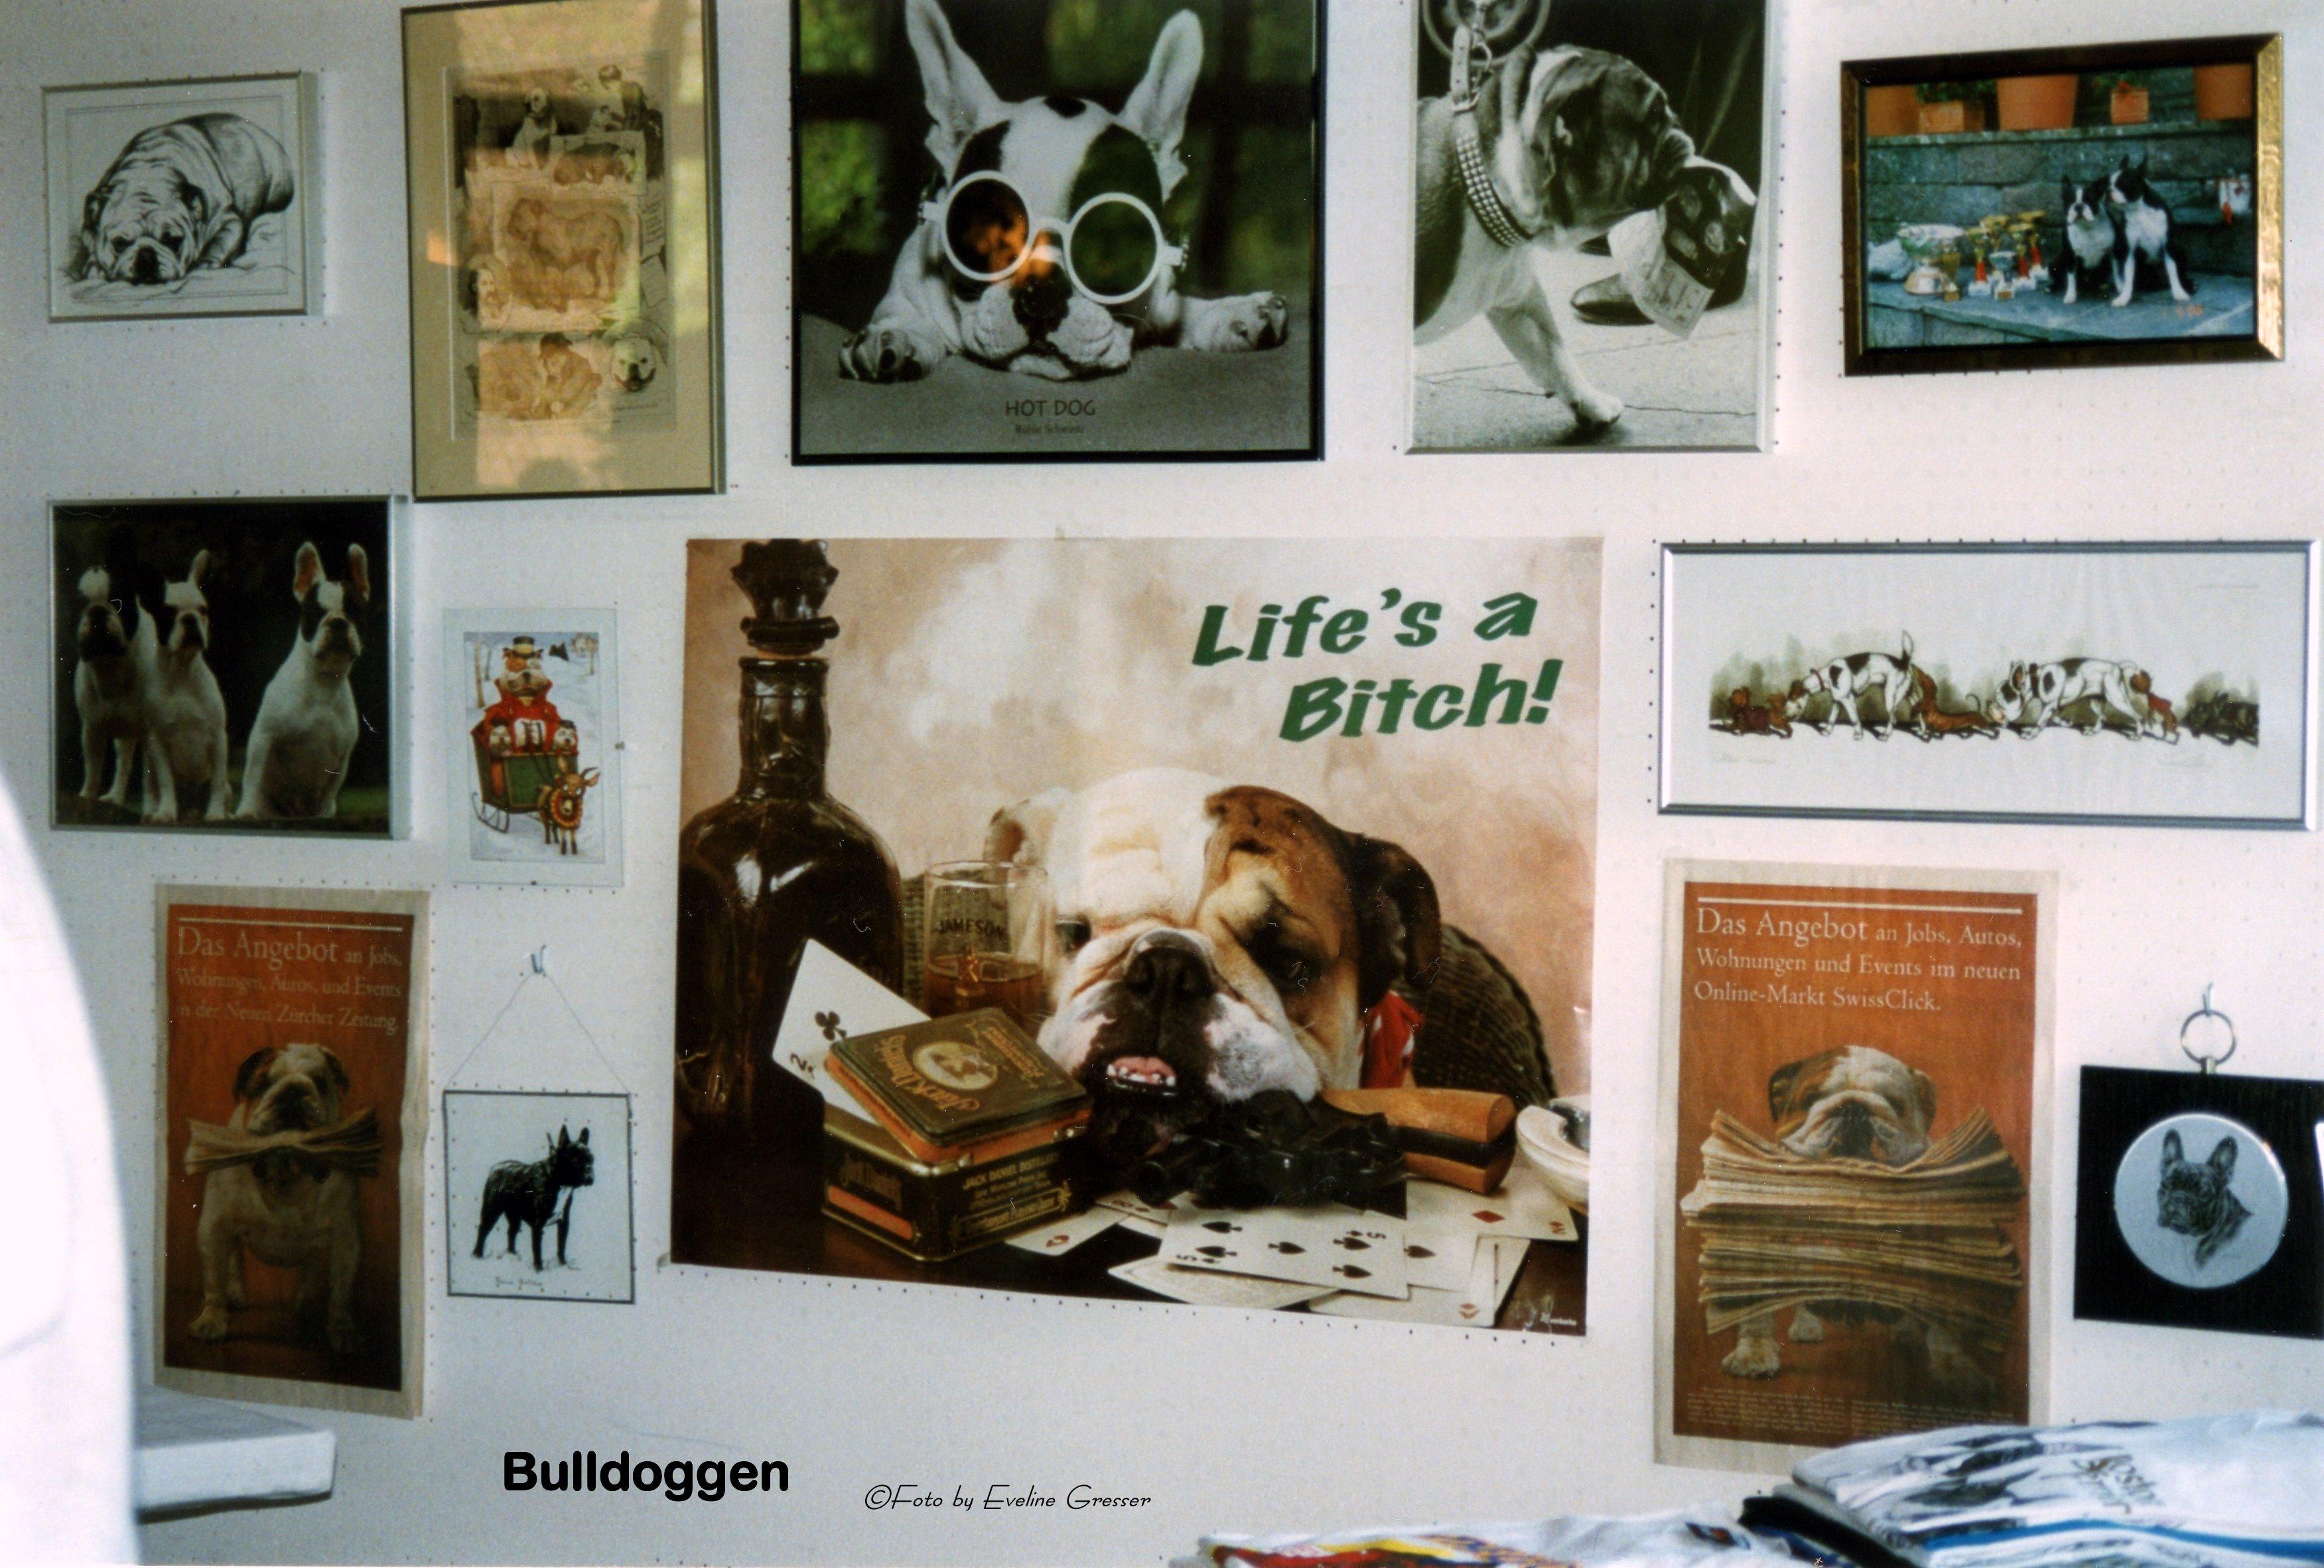 09StandBulldogs